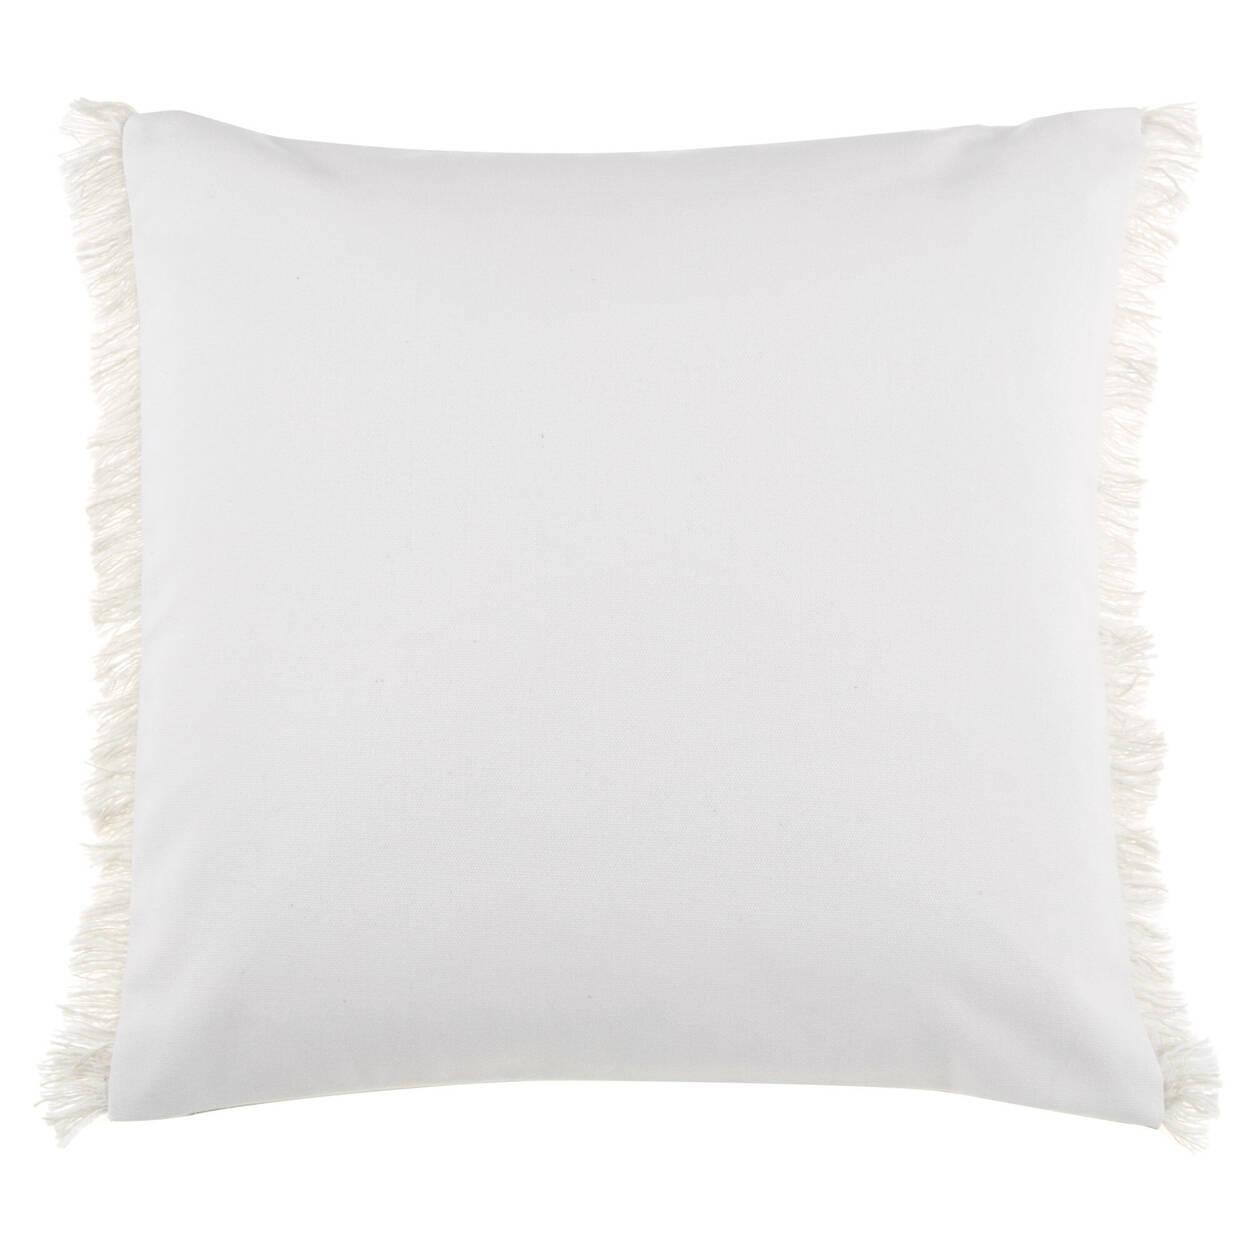 "Amina English Typography Decorative Pillow 19"" x 19"""